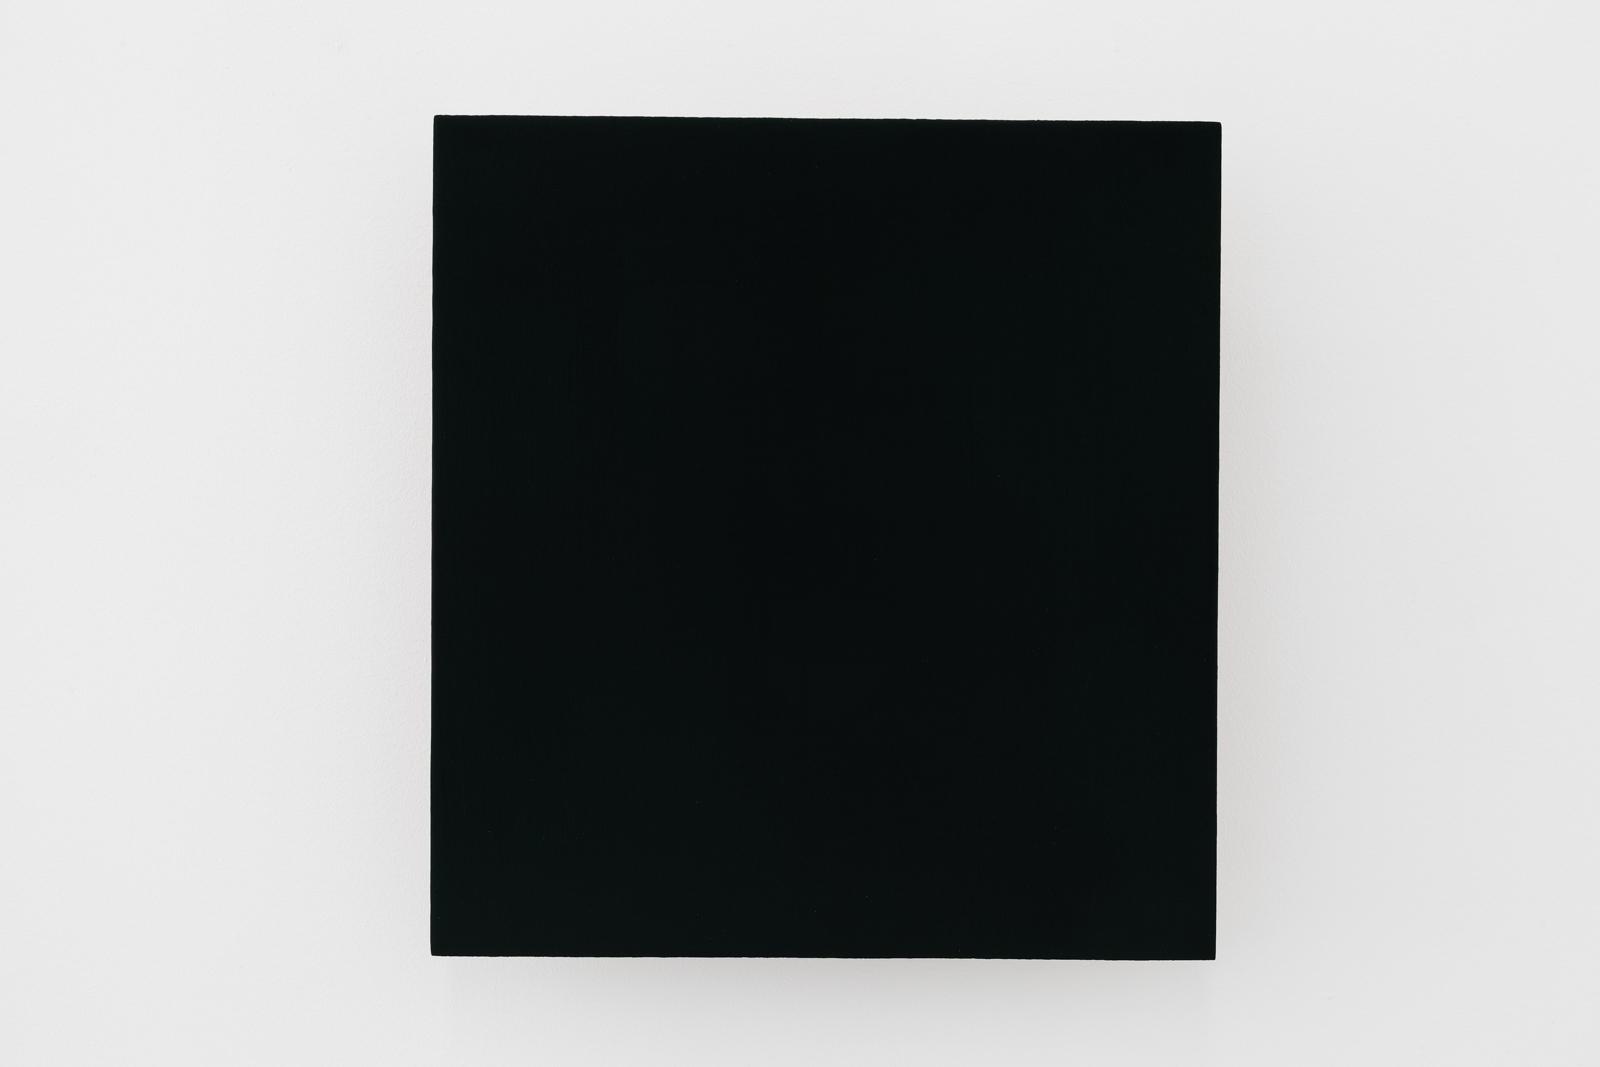 Günter Umberg, Untitled, 1995/1998, Polymer, pigment and dammar on wood, 35 x 32,5 cm